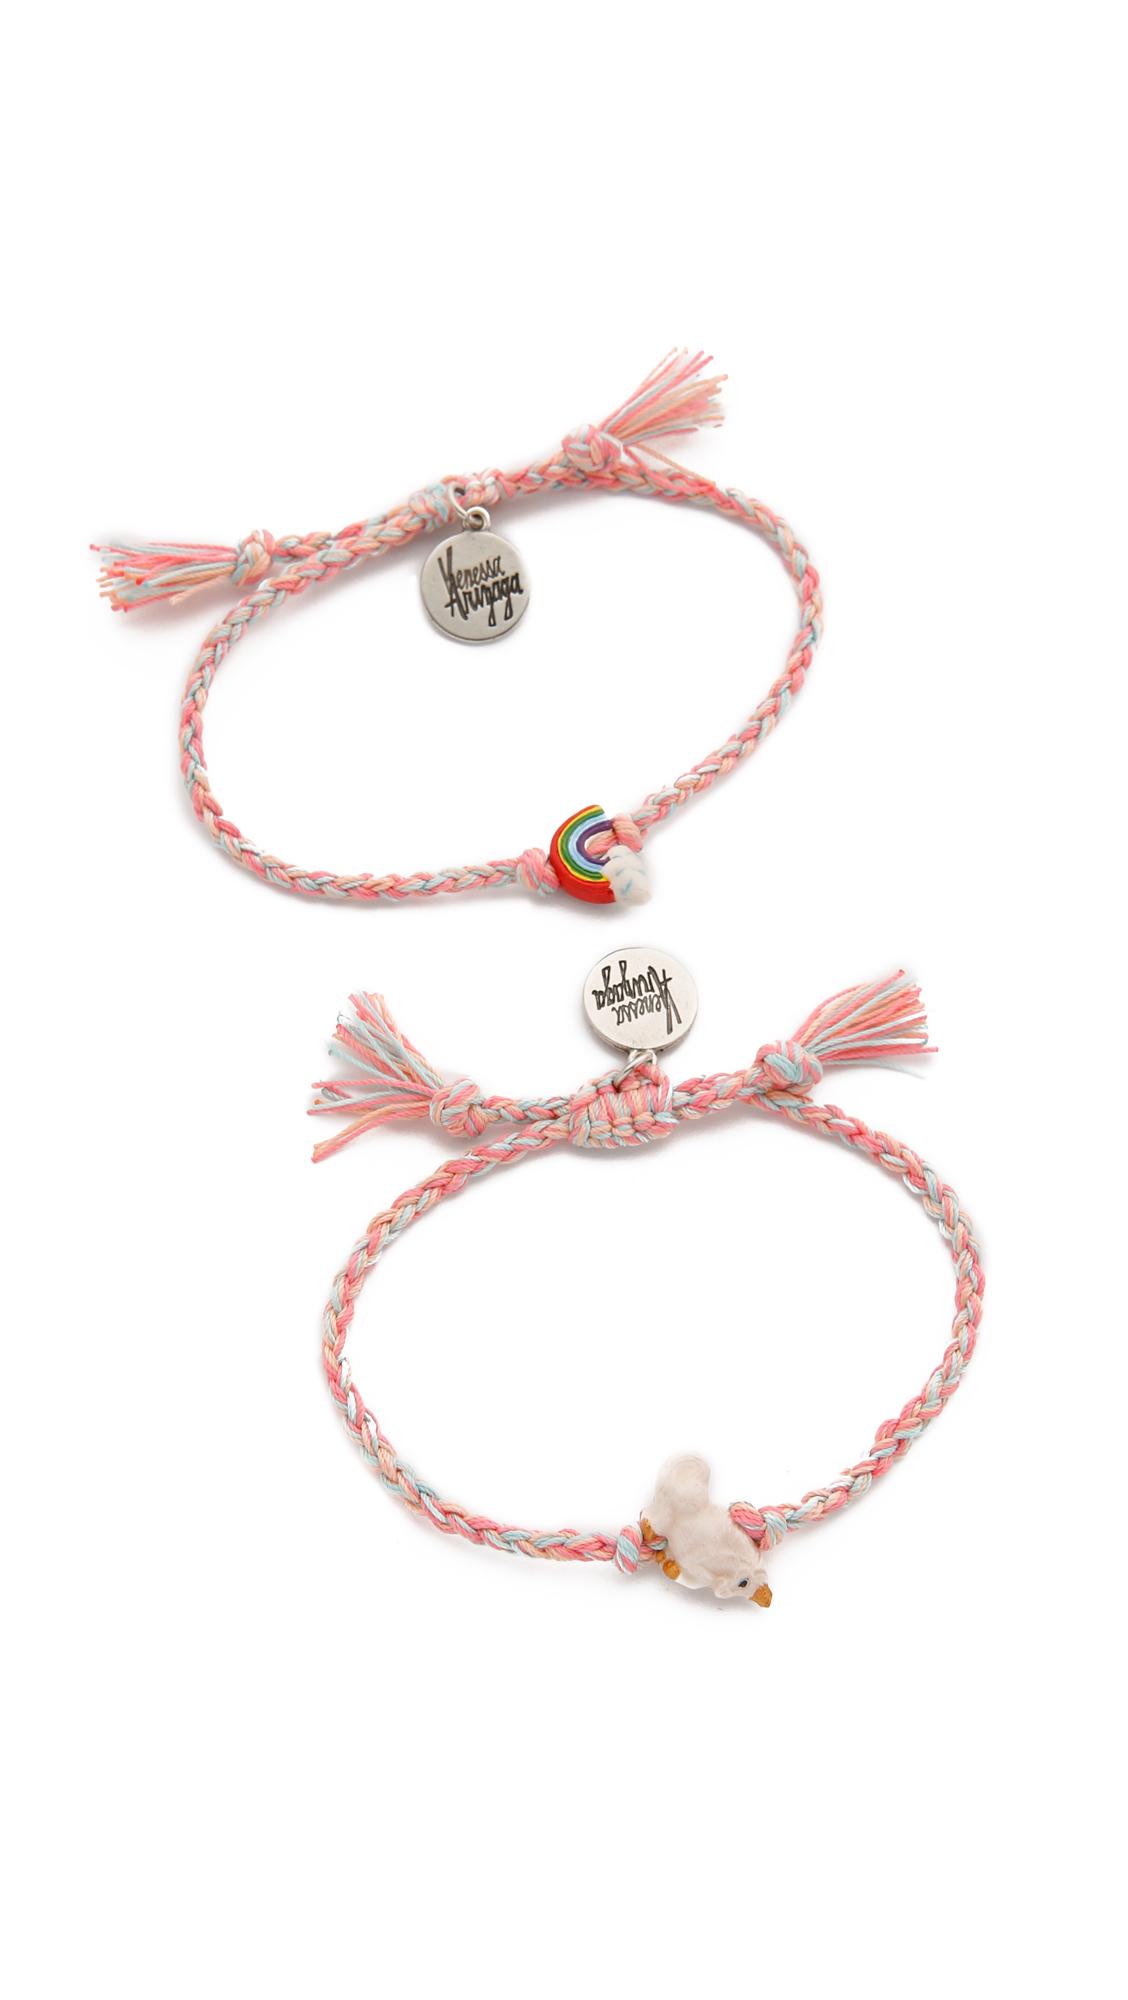 Venessa Arizaga lucky bracelet rrdW19iQbr